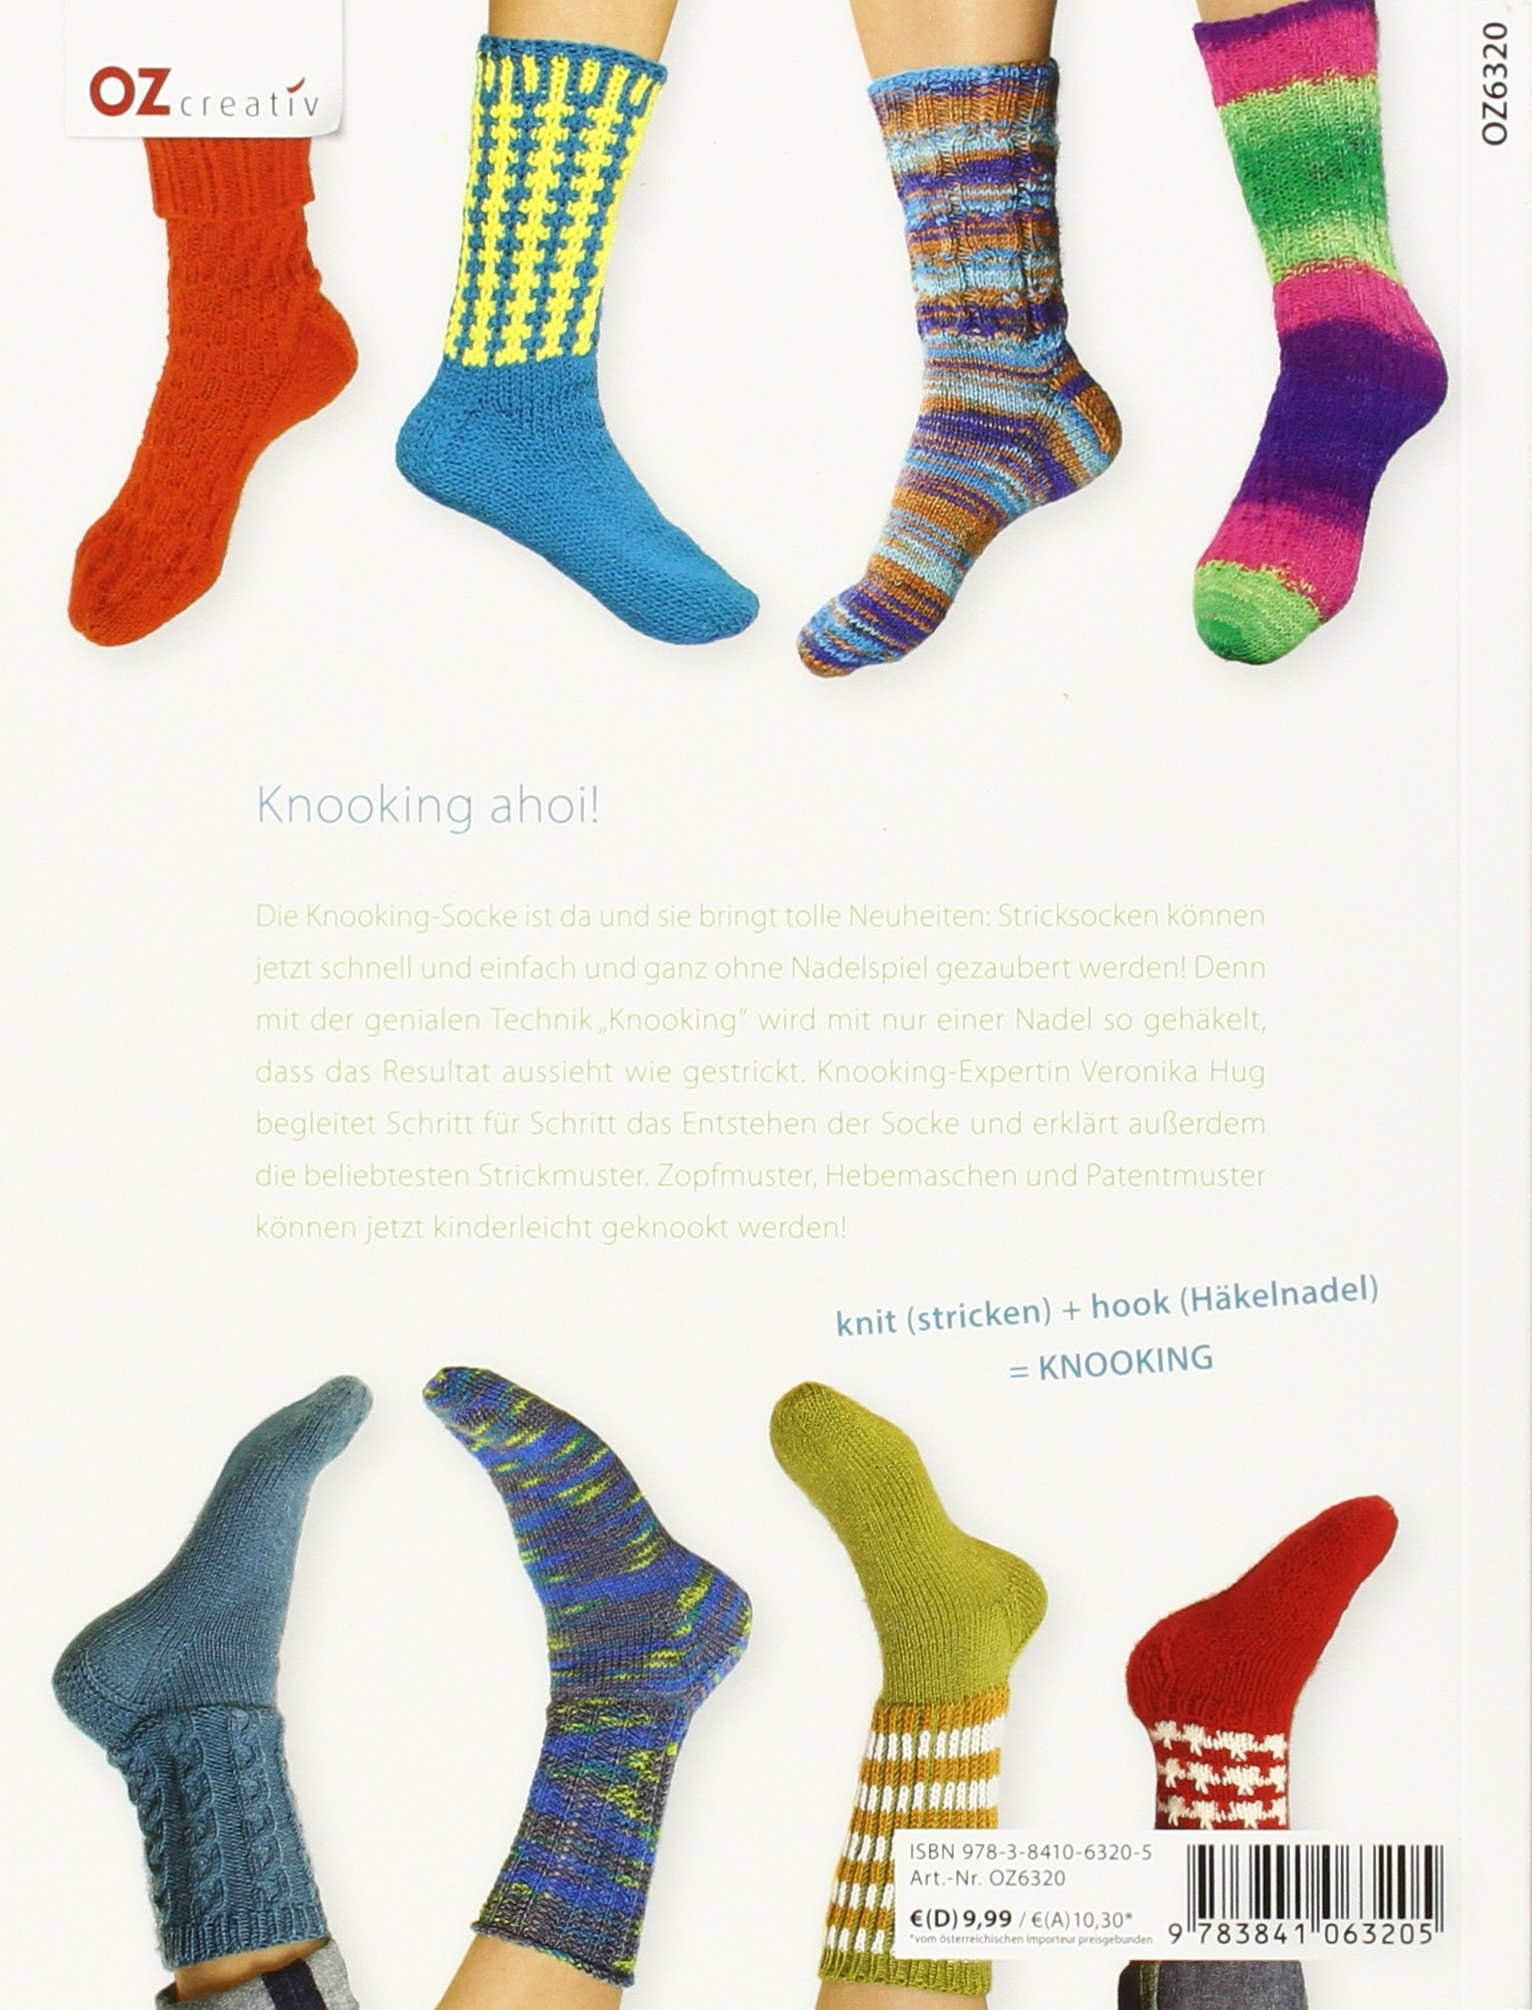 Die Knooking Socke Socken Häkeln Wie Gestrickt Amazonde Veronika